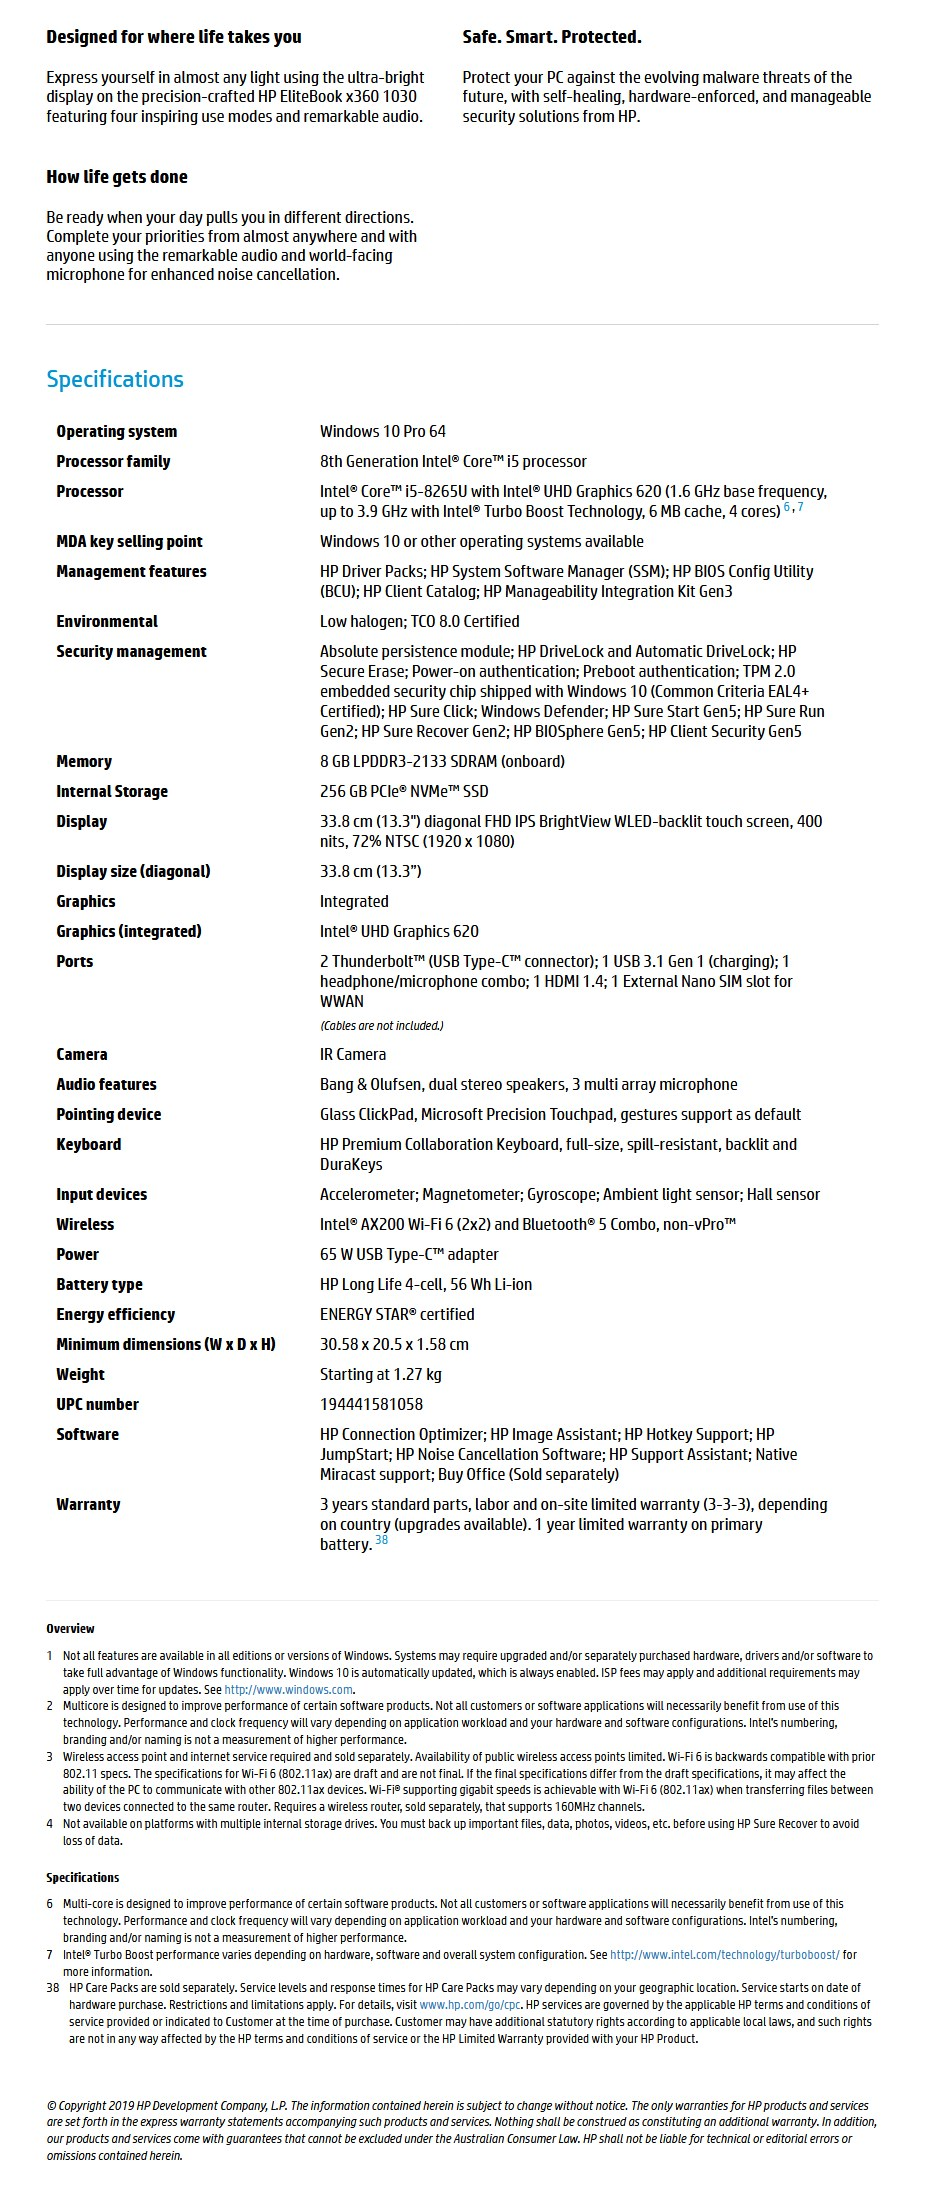 "HP EliteBook x360 1030 G4 13.3"" Laptop i5-8265U 8GB 256GB W10P - Touch - Overview 1"